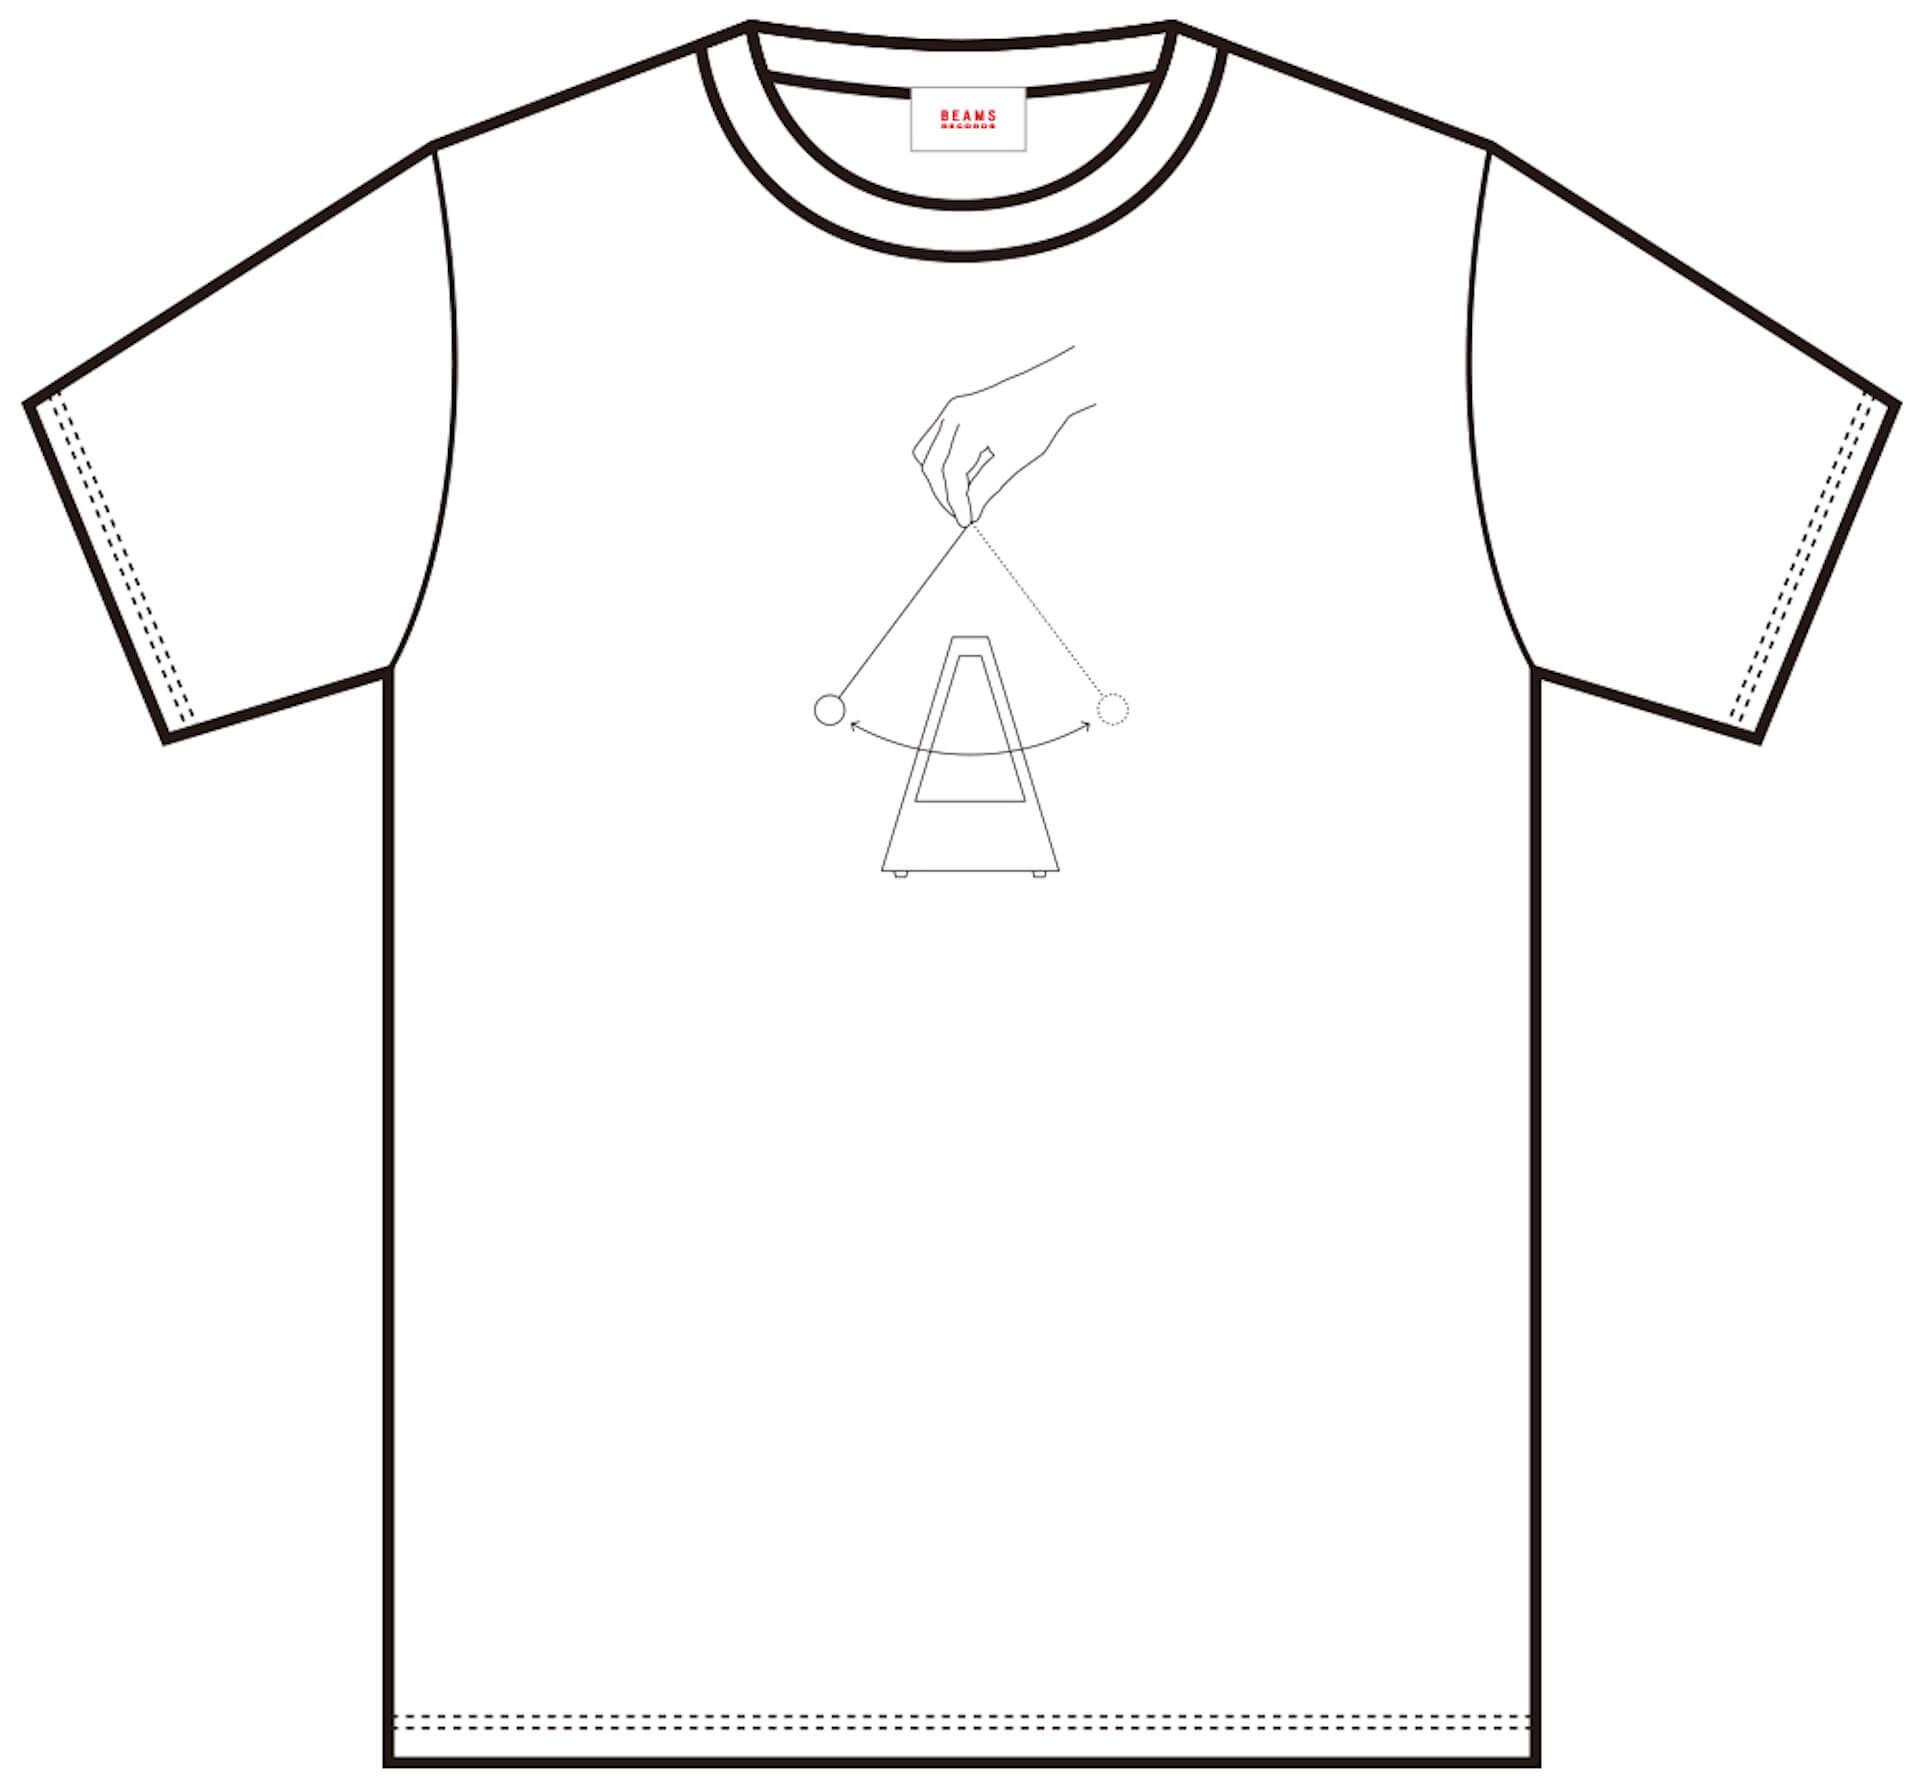 J-WAVE「#音楽を止めるな」BEAMS RECORDS協力のもと、ライブハウスを支援するオリジナルTシャツが受注販売開始! lf200515_jwave_beamsrecords_tshirts_06